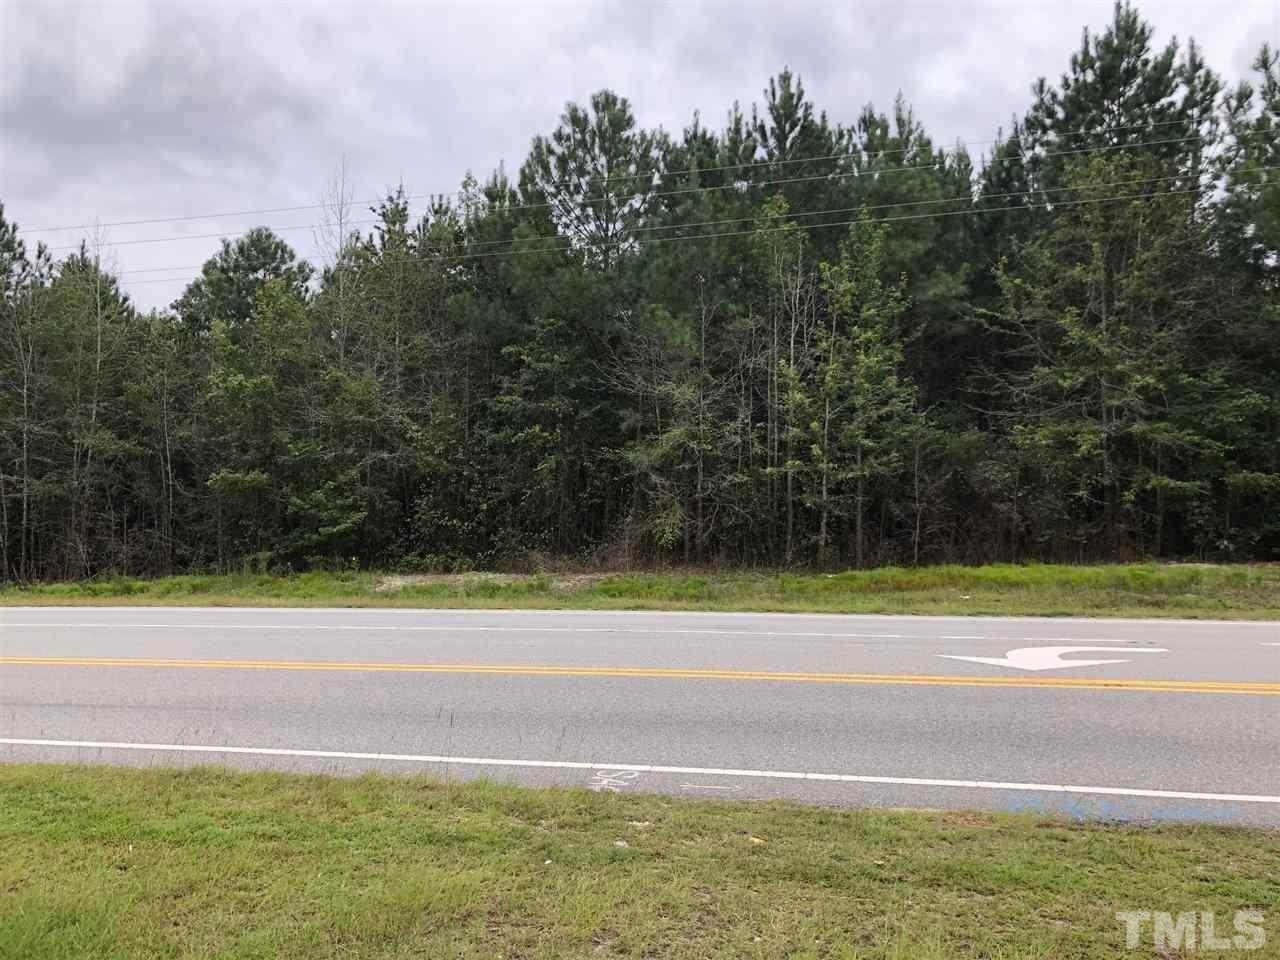 00 NC 27 West Nc 27 Highway - Photo 1